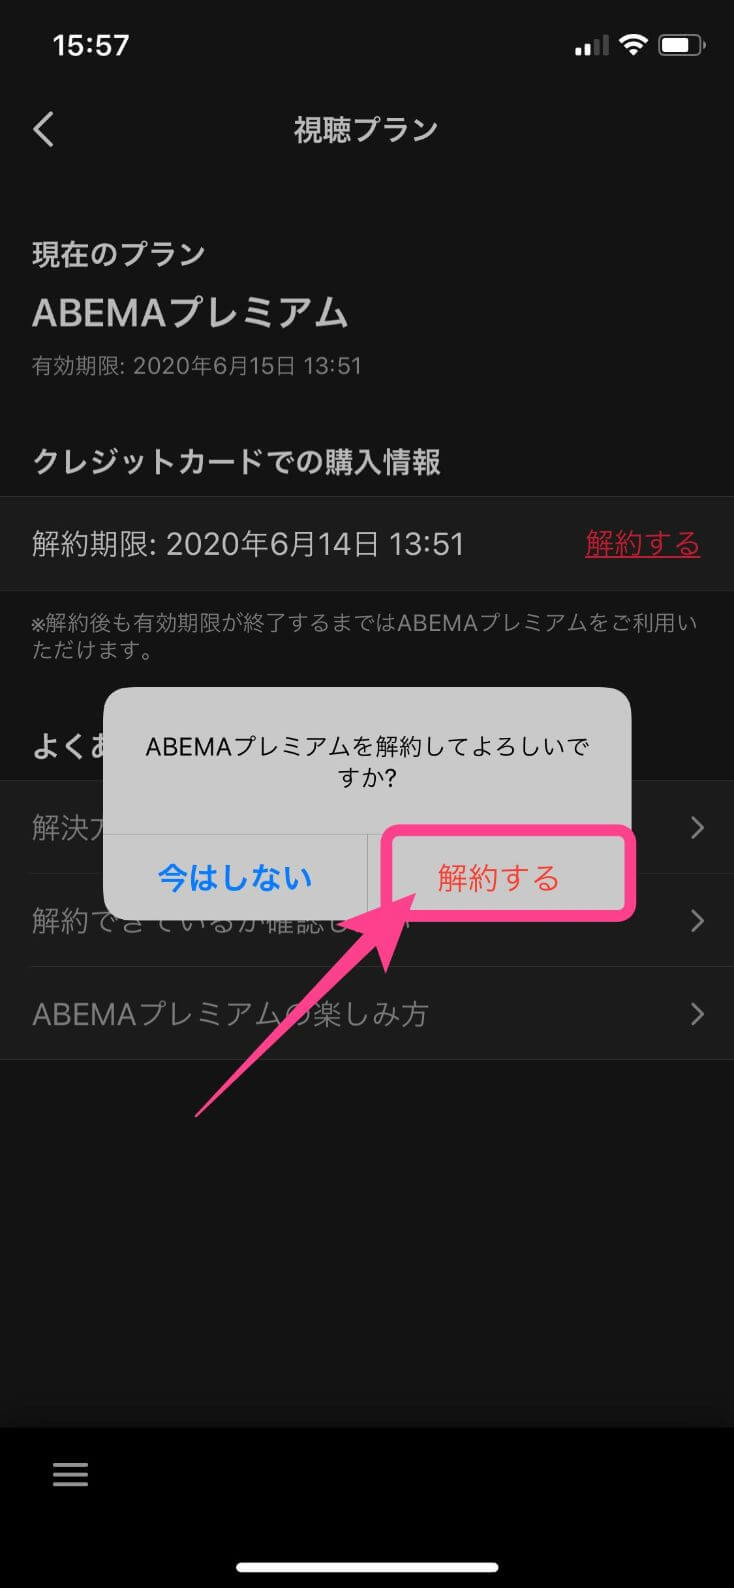 ABEMAプレミアム解約手順(再度解約するを選択)